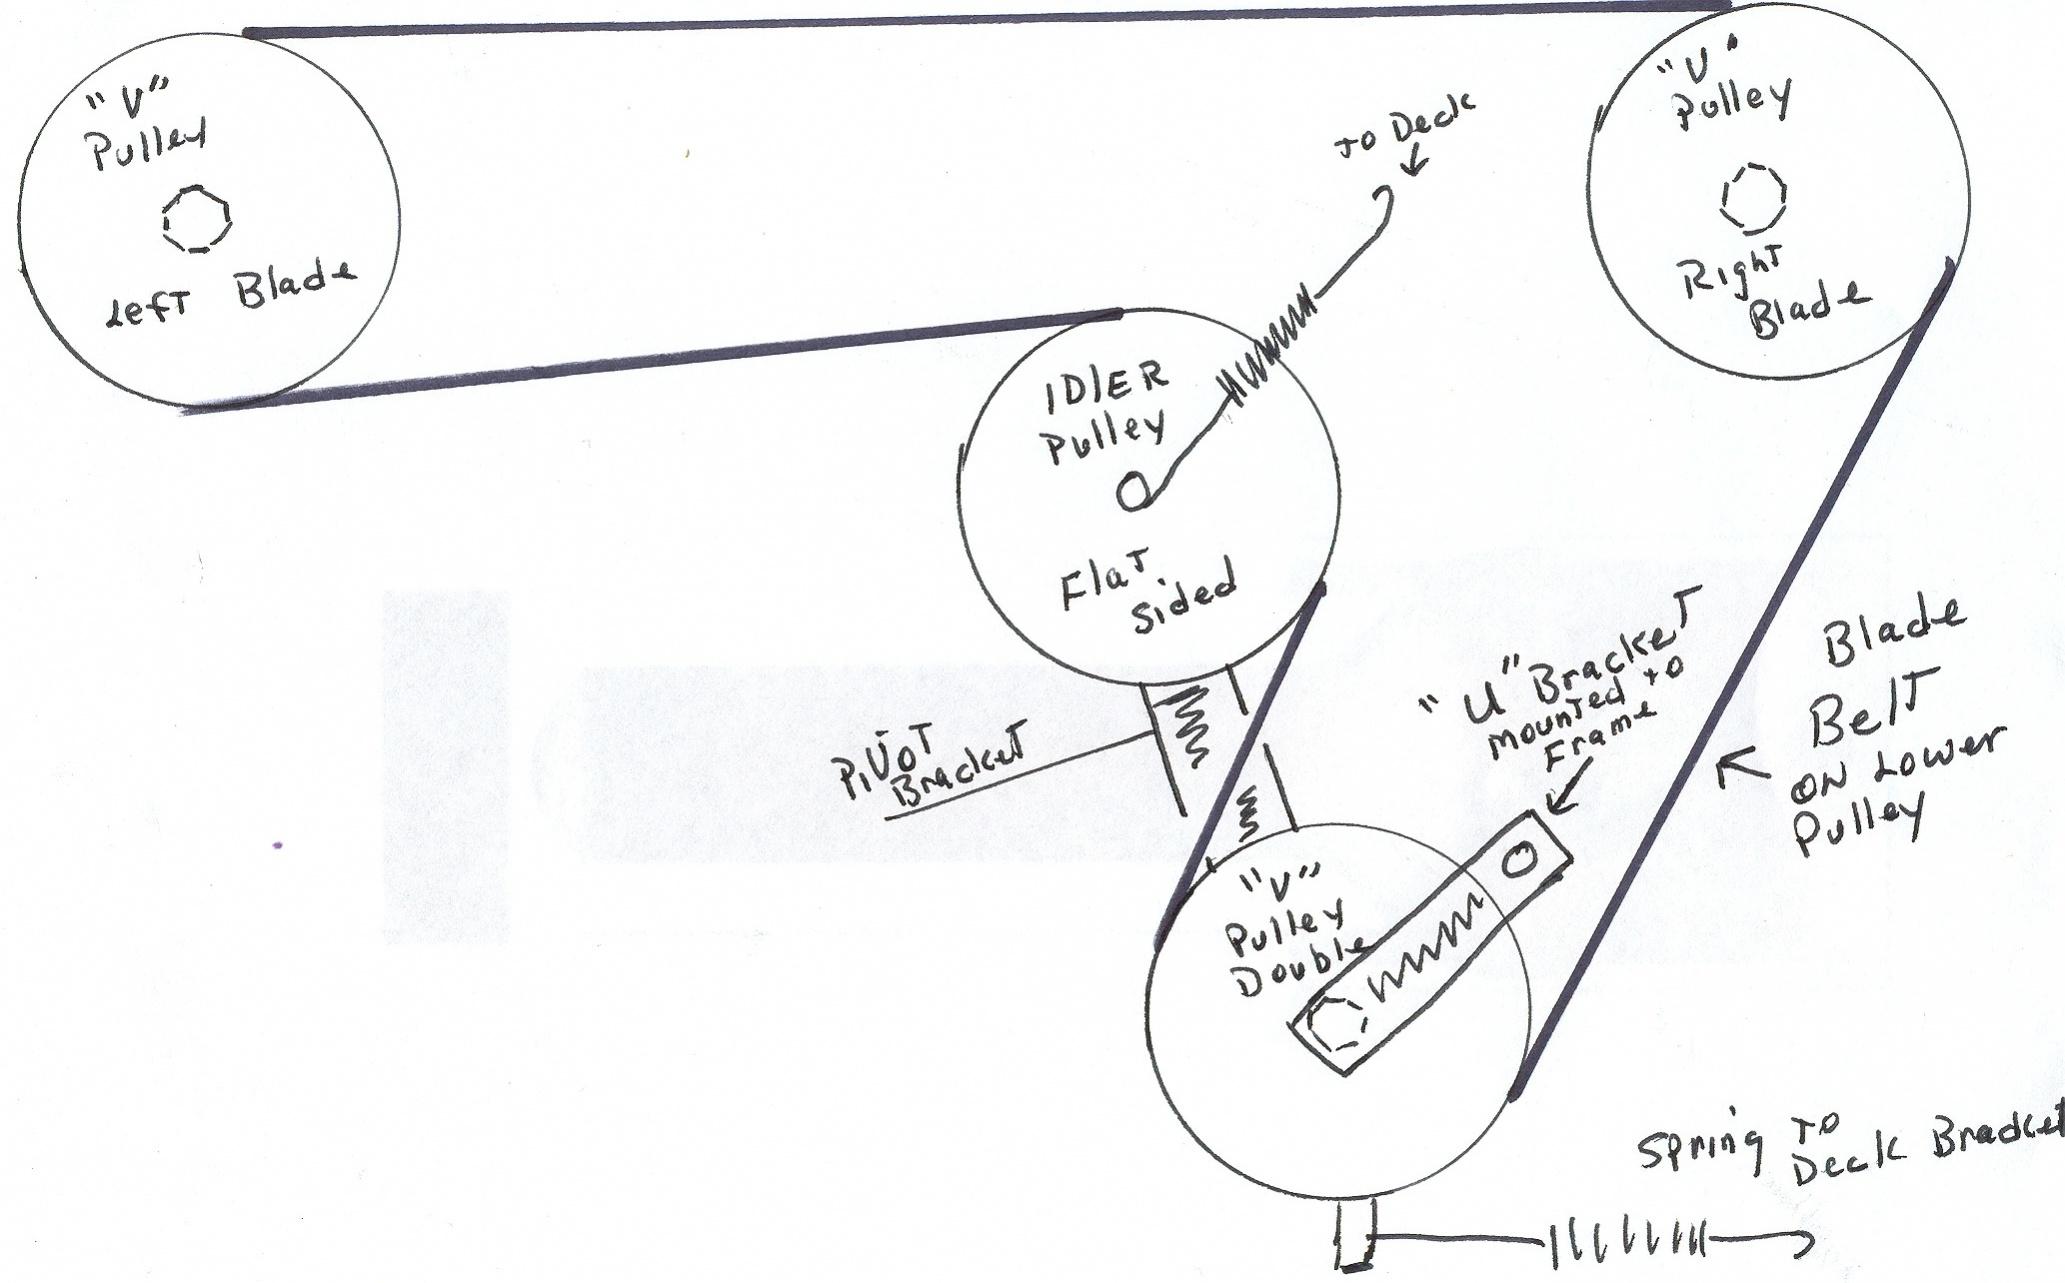 Stx38 Drive Belt  U0026 Deck Belt Routing Diagrams